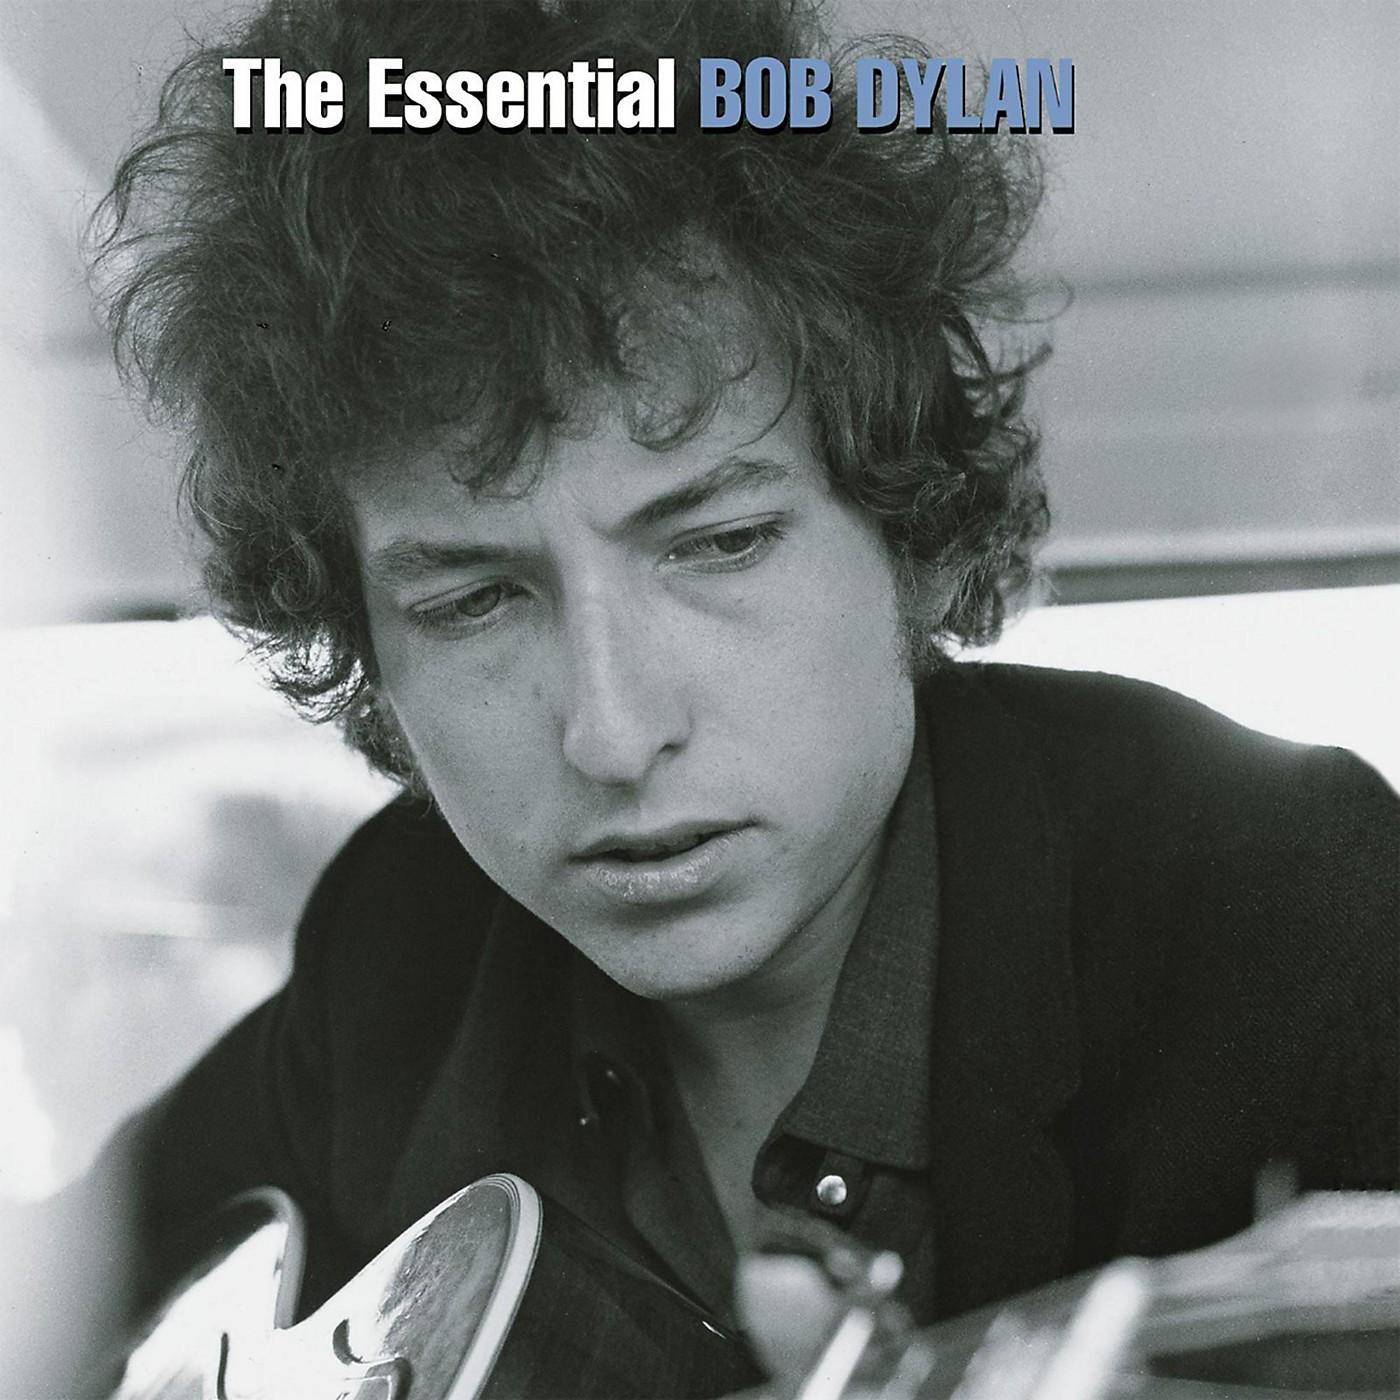 Sony Bob Dylan - The Essential Bob Dylan thumbnail